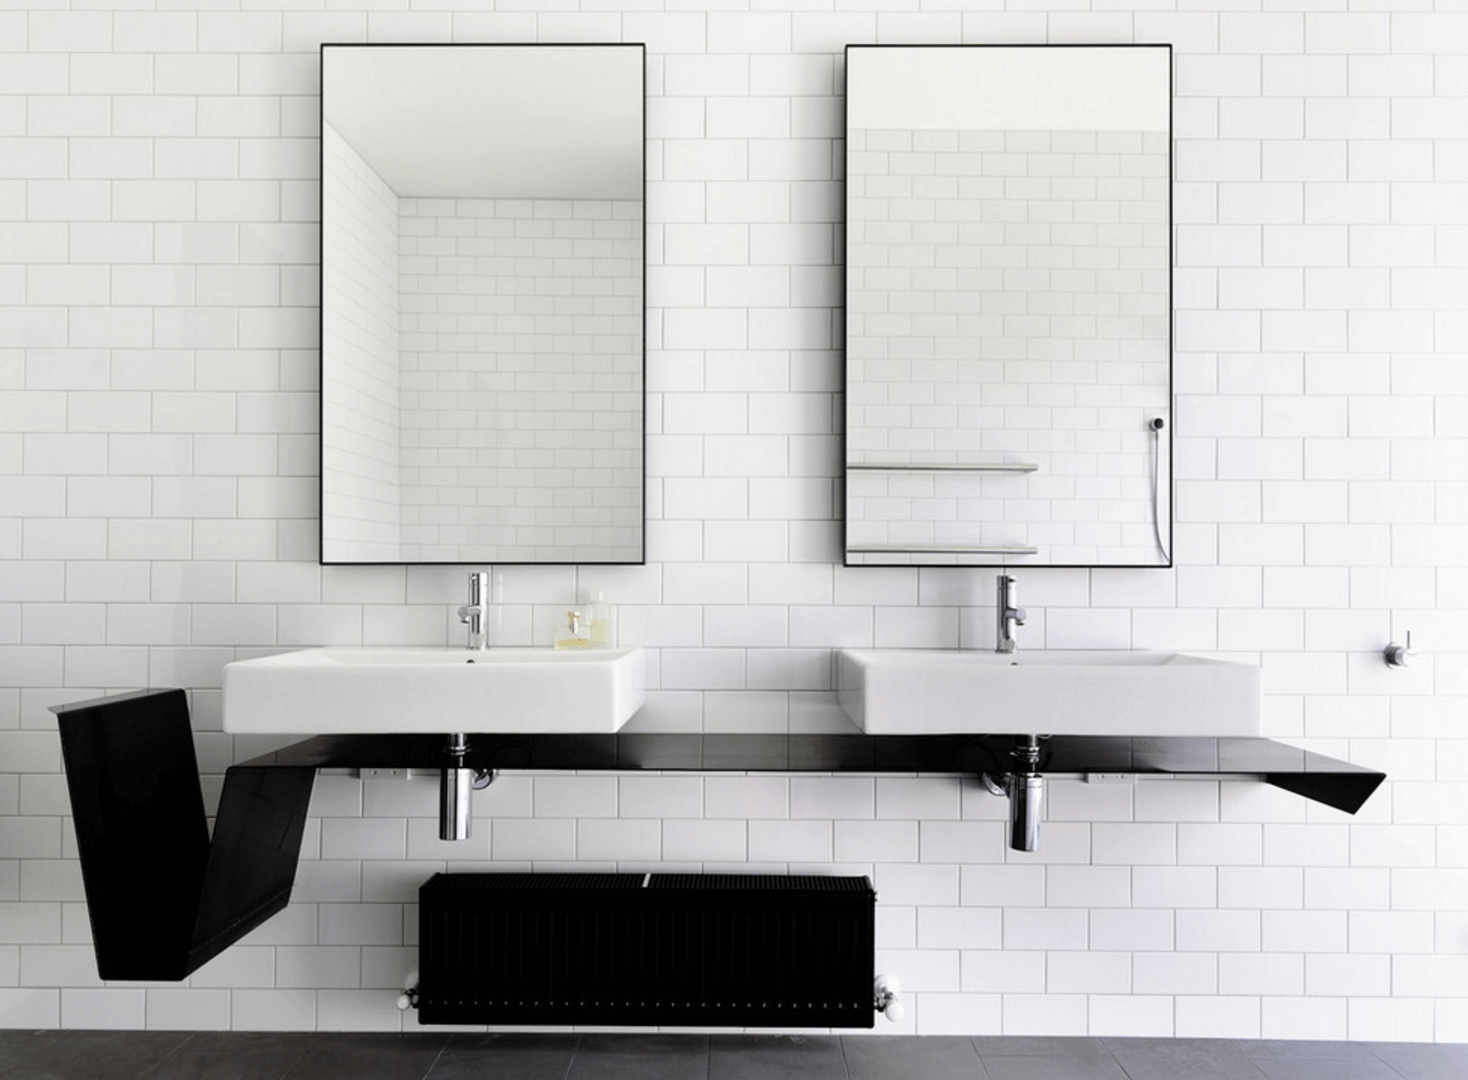 38 Bathroom Mirror Ideas To Reflect Your Style Modern Bathroom